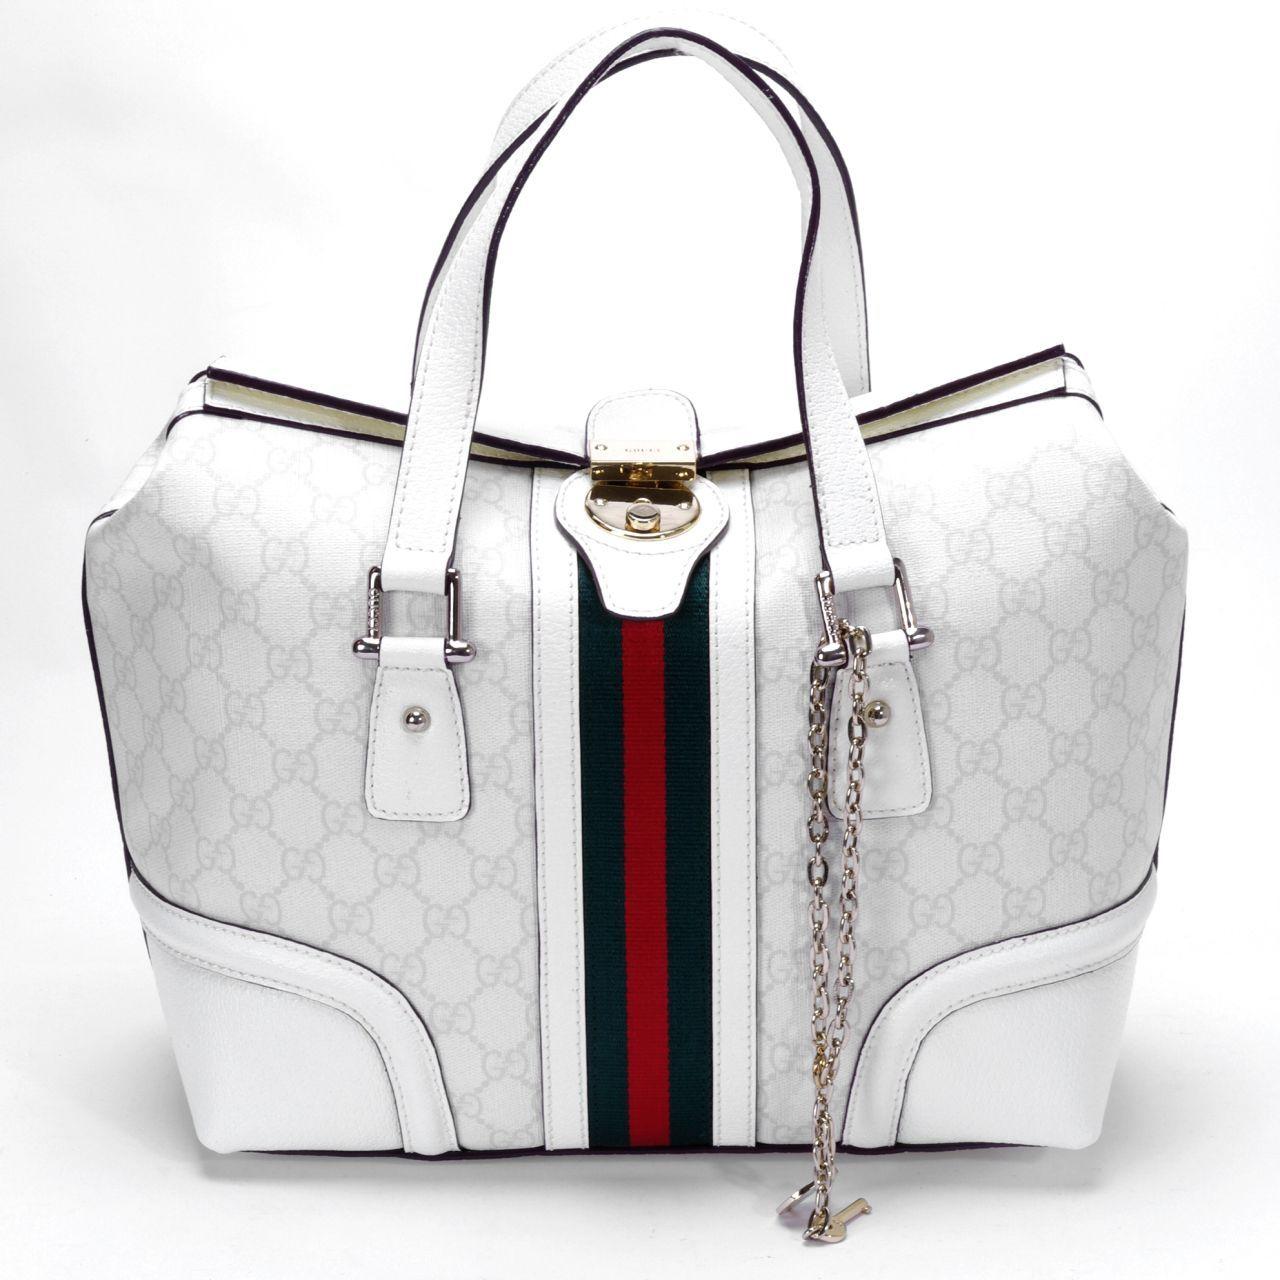 Gucci handbags 2013